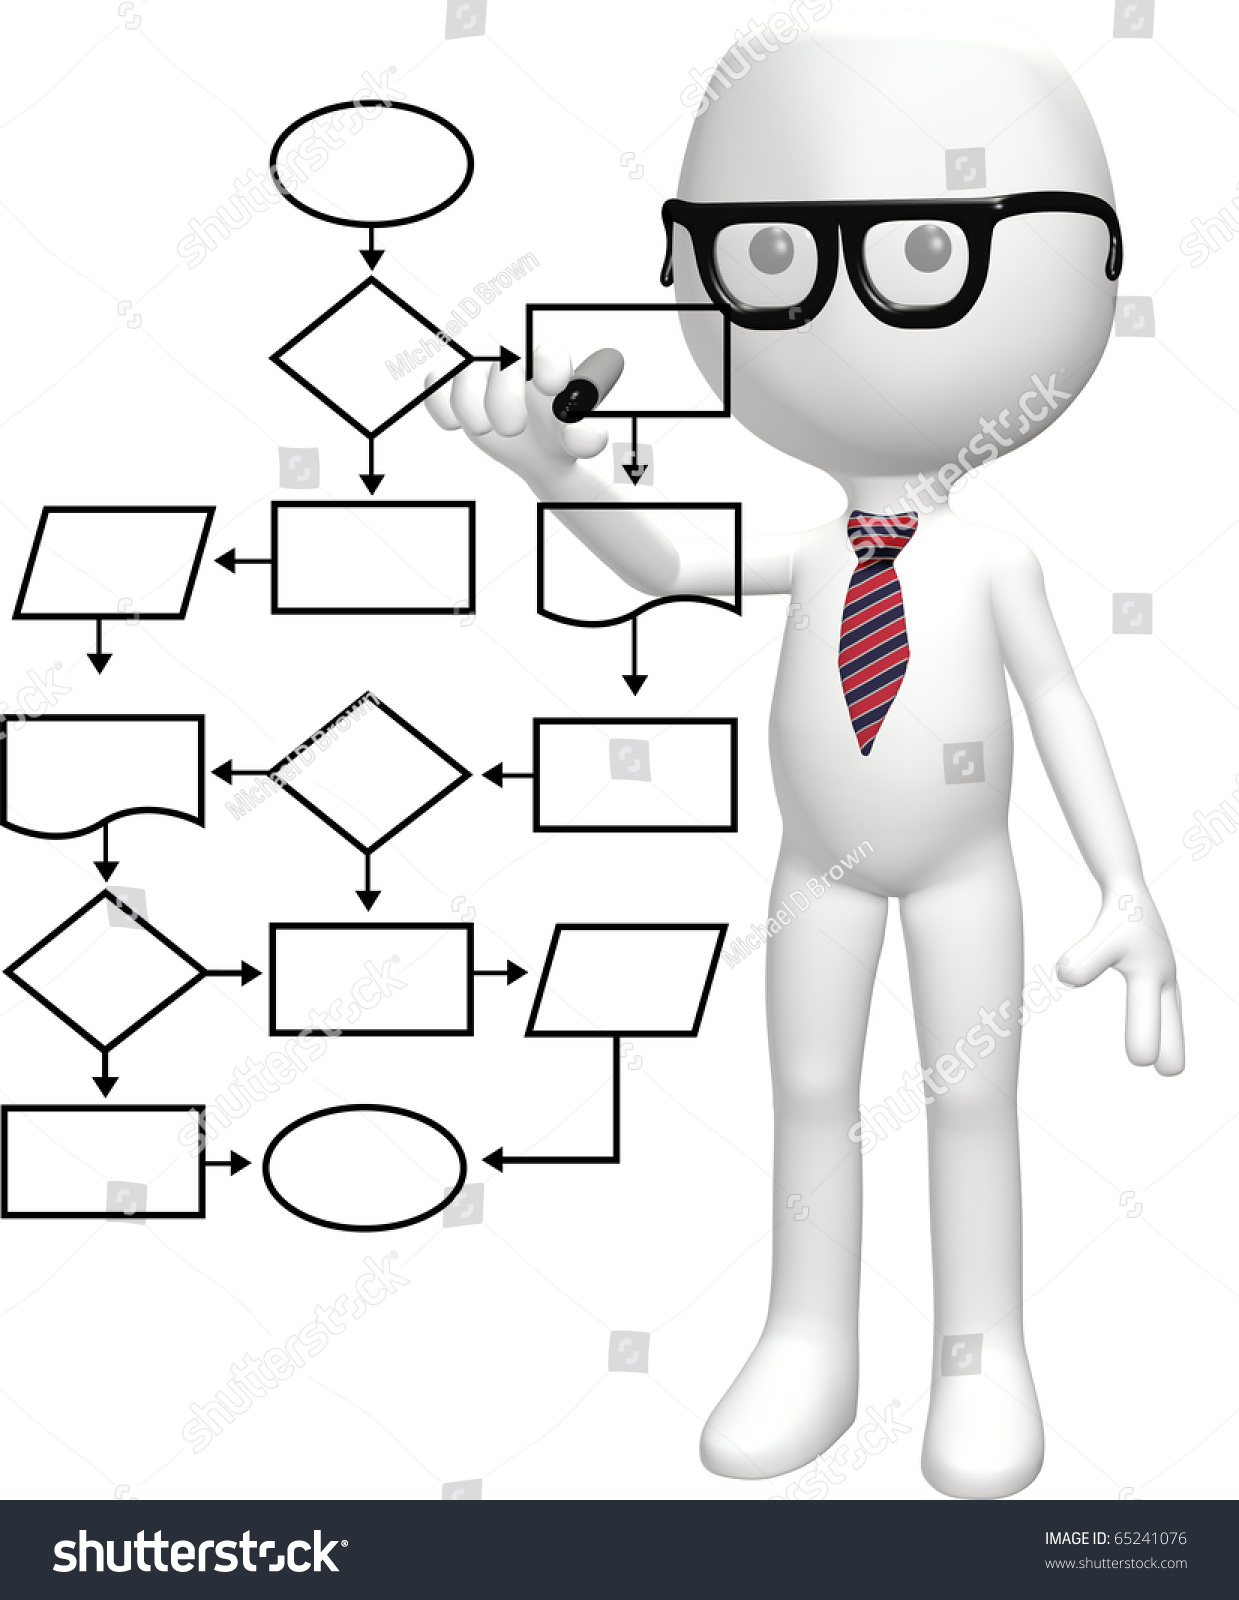 Cartoon nerd genius programs smart flowchart stock illustration a cartoon nerd genius programs a smart flowchart process management system nvjuhfo Choice Image